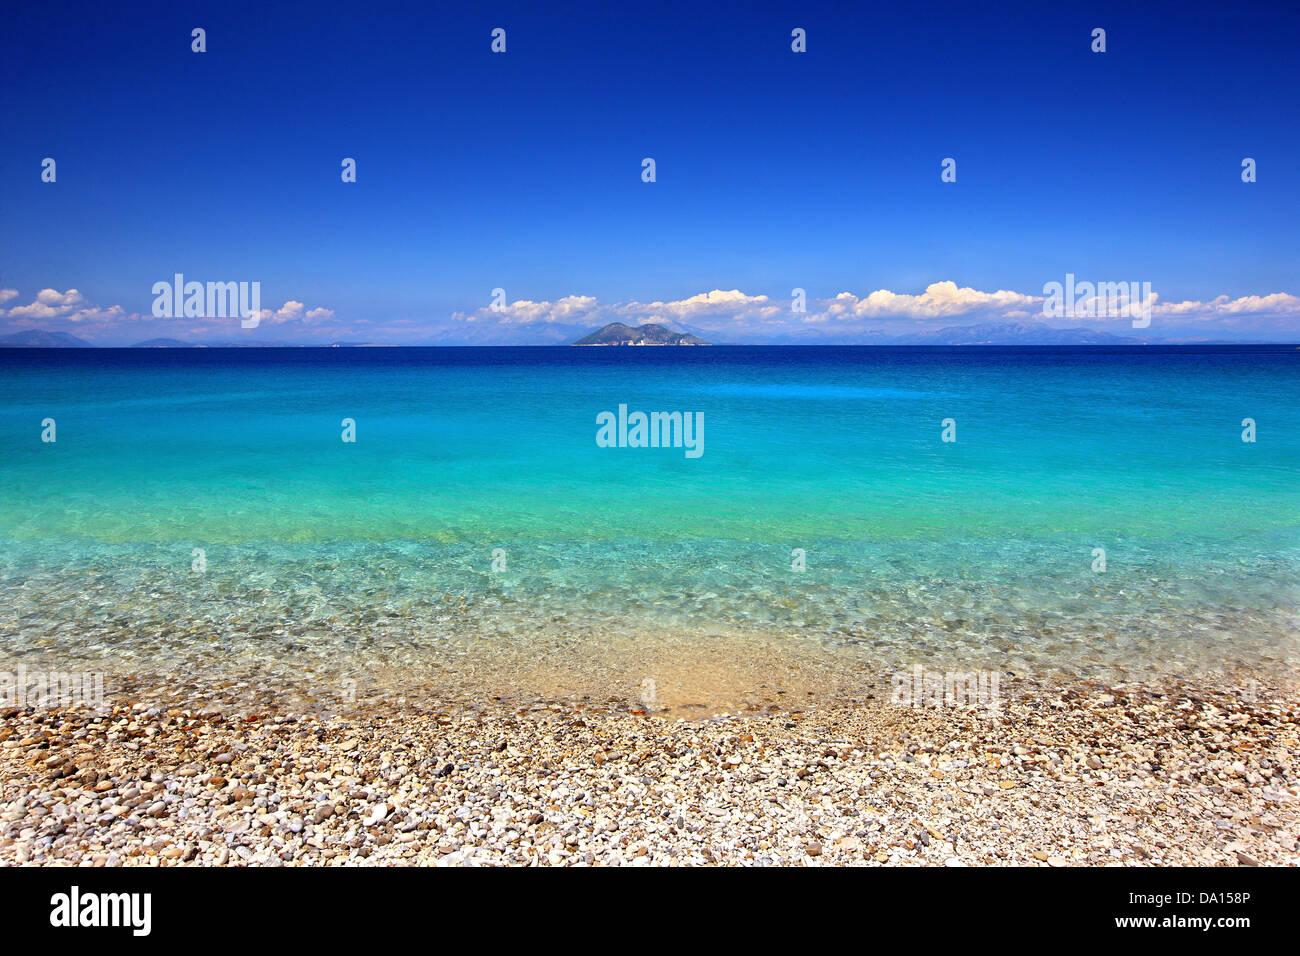 Gidaki beach, the most beautiful beach of Ithaca ('Ithaki') island, Ionian Sea, Eptanisa ('Seven Islands'), - Stock Image